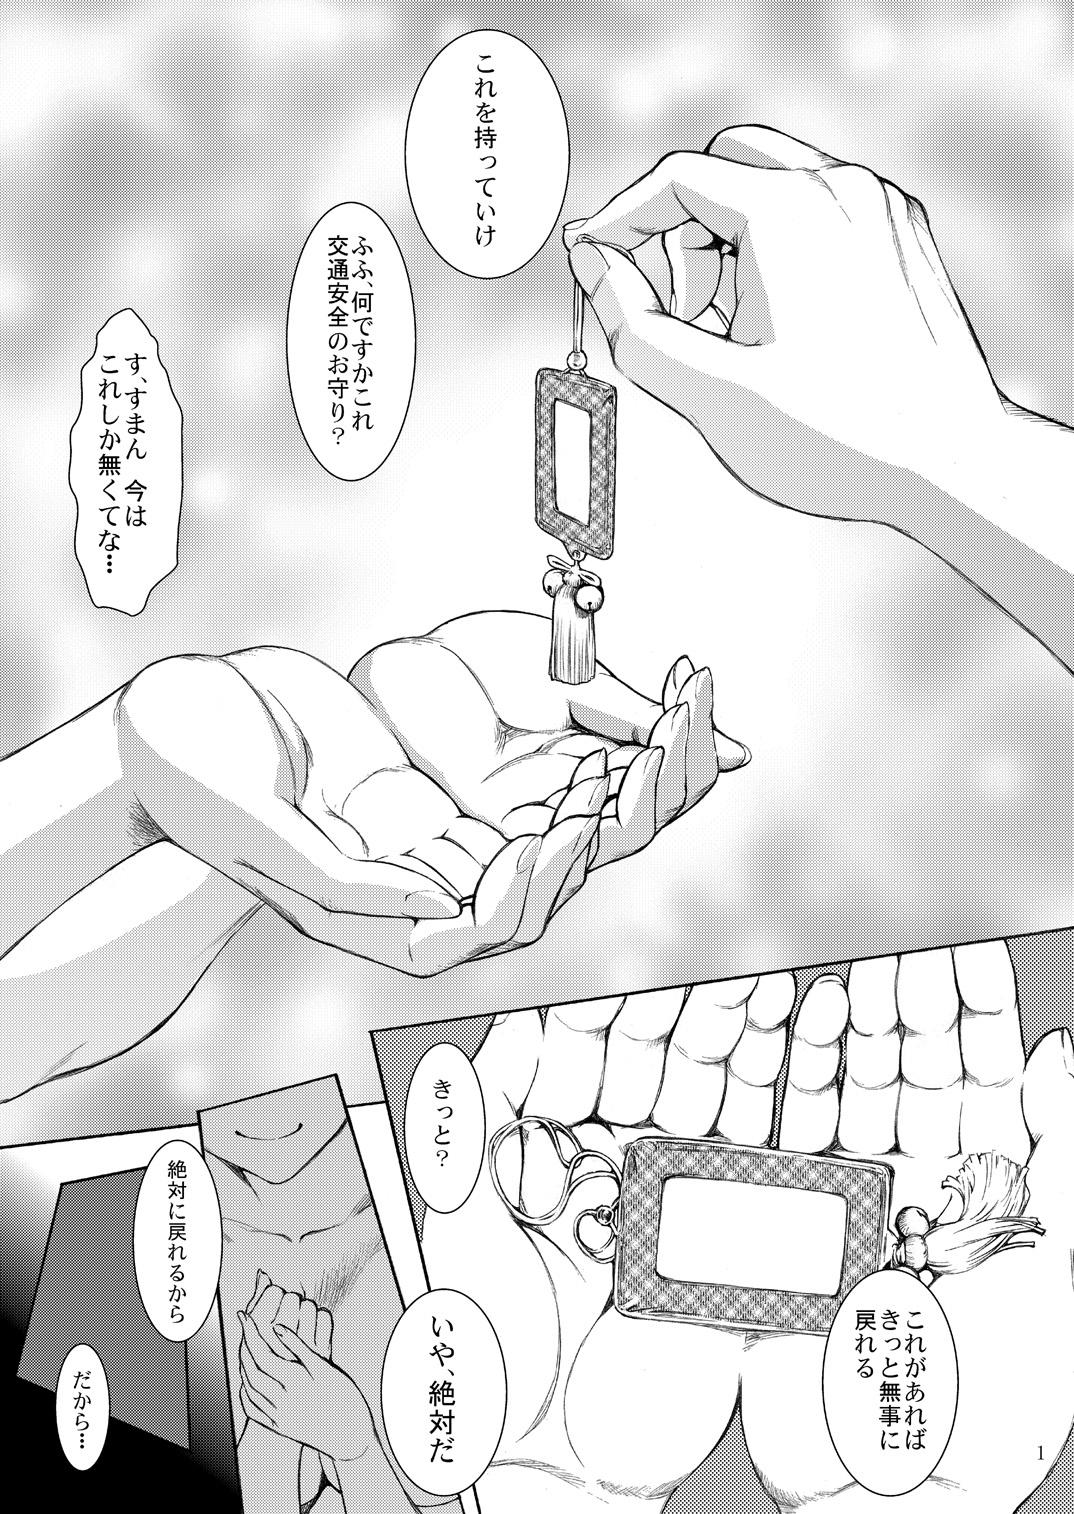 Yamato Shisu 1 1